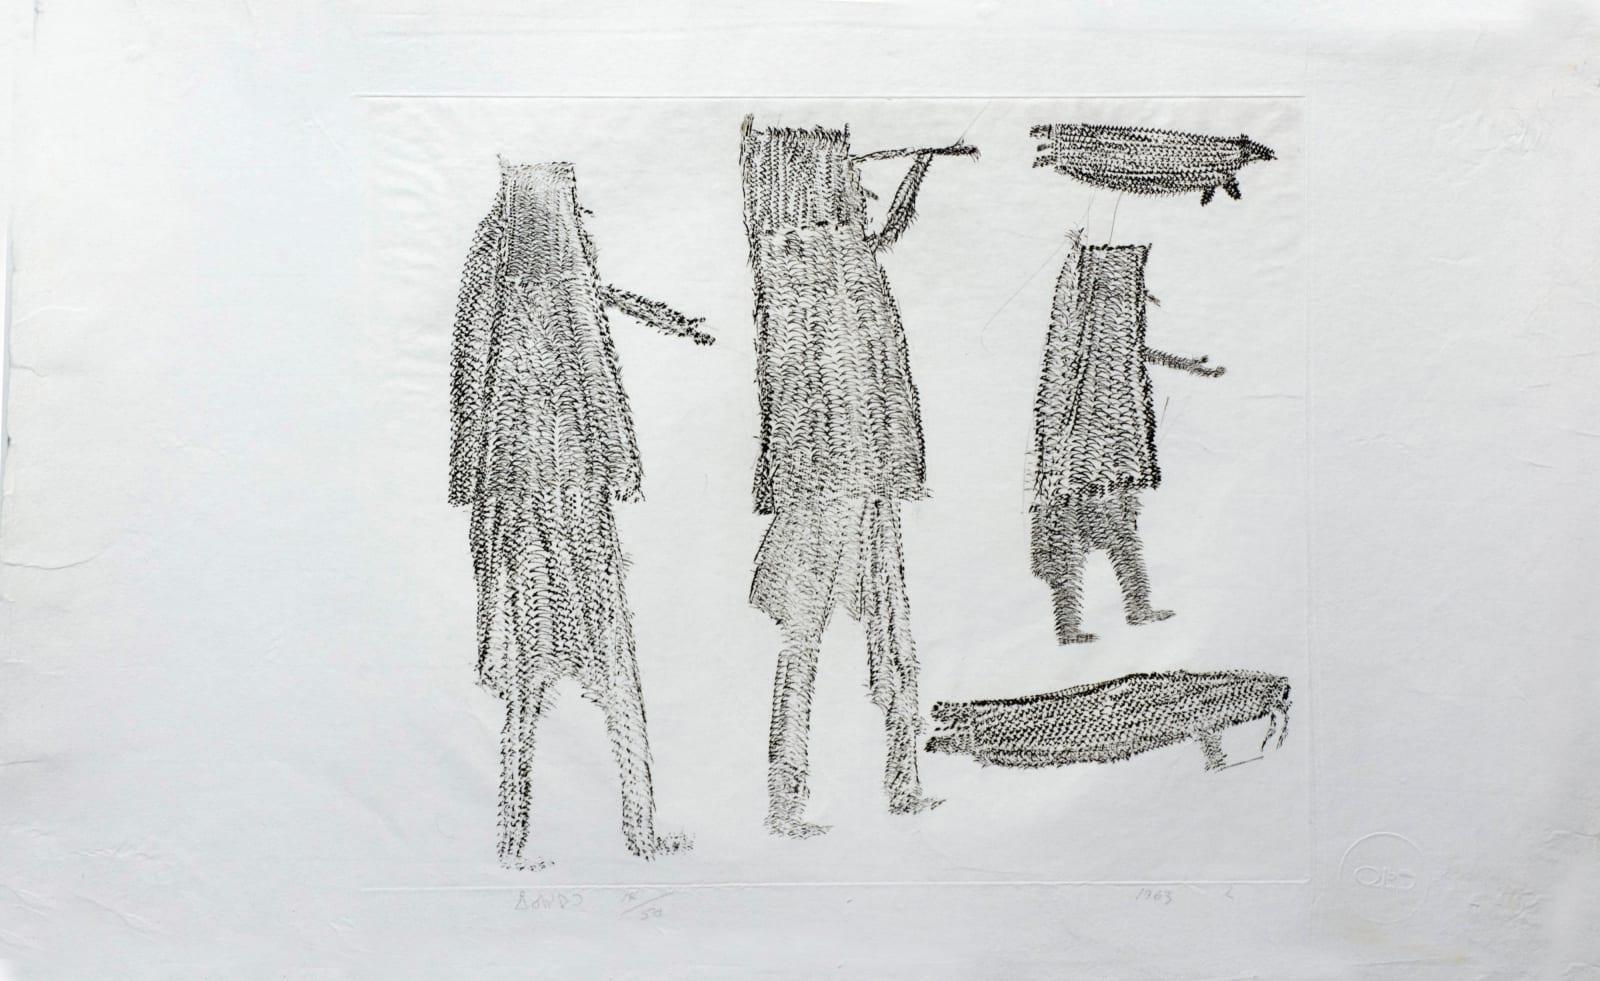 PARR (1893-1969) KINNGAIT (CAPE DORSET) Walrus Hunt, 1963 #42 engraving sheet: 12 1/4 x 15 1/4 in (31.1 x 38.7 cm) plate: 8 3/4 x 11 3/4 in (22.2 x 29.8 cm) $1,000